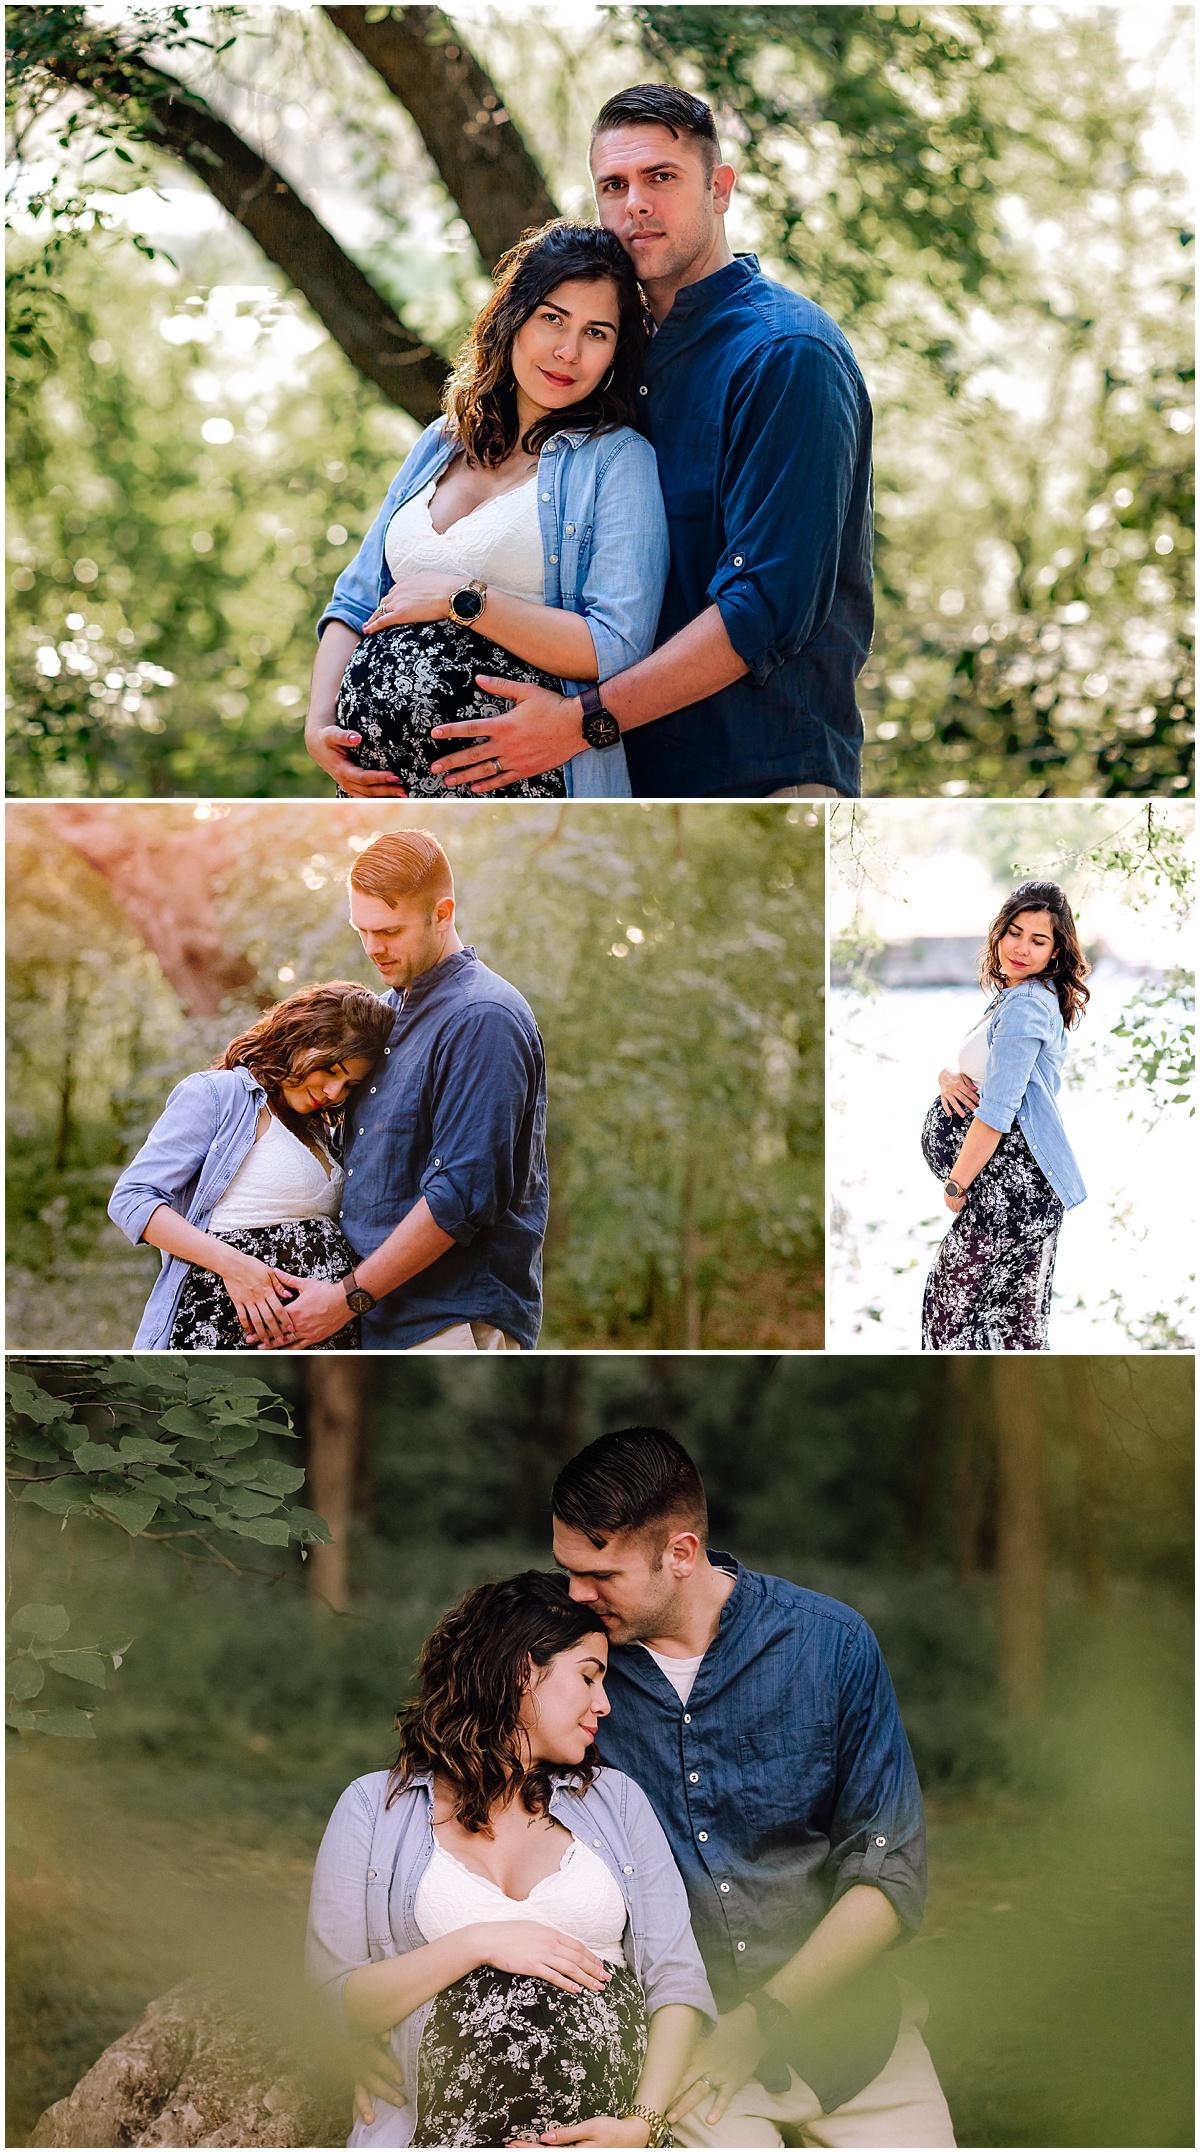 Maternity-Photo-Session-Brakenridge-Park-San-Antonio-Texas-Carly-Barton-Photography_0009.jpg